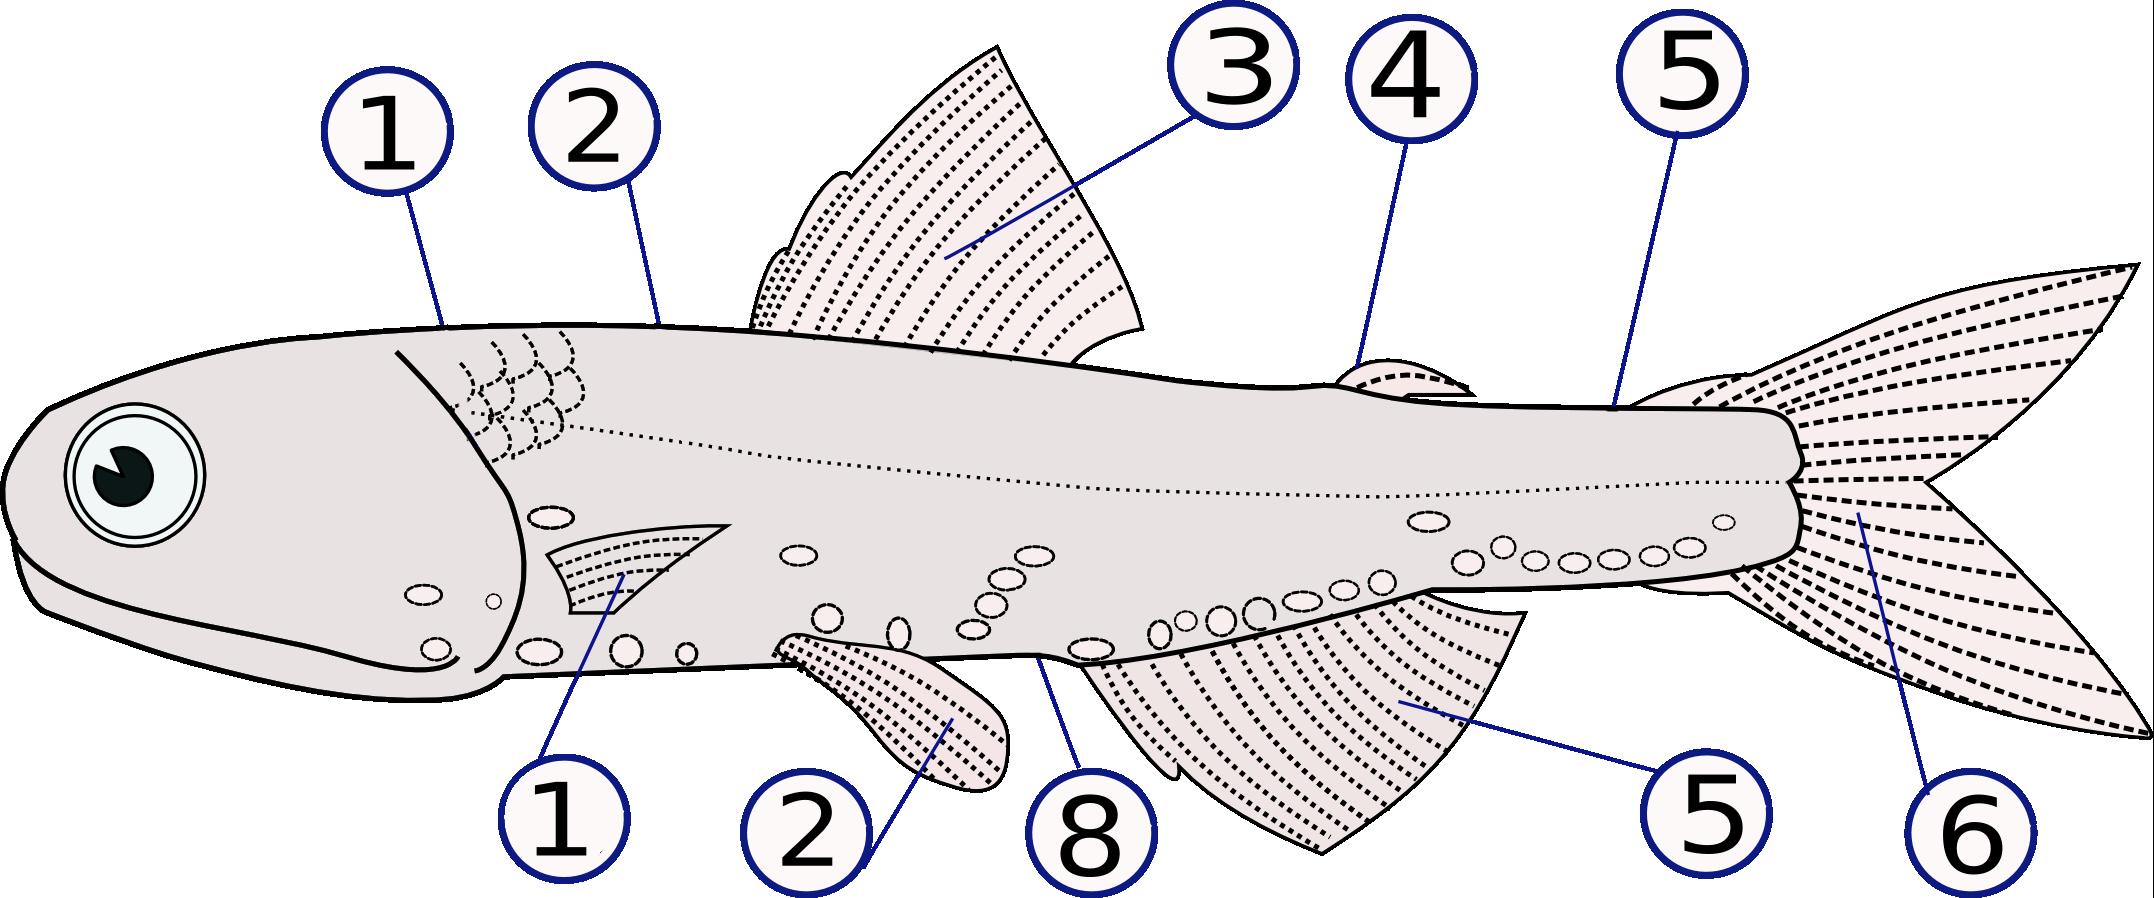 Fish Fin Wikipedia